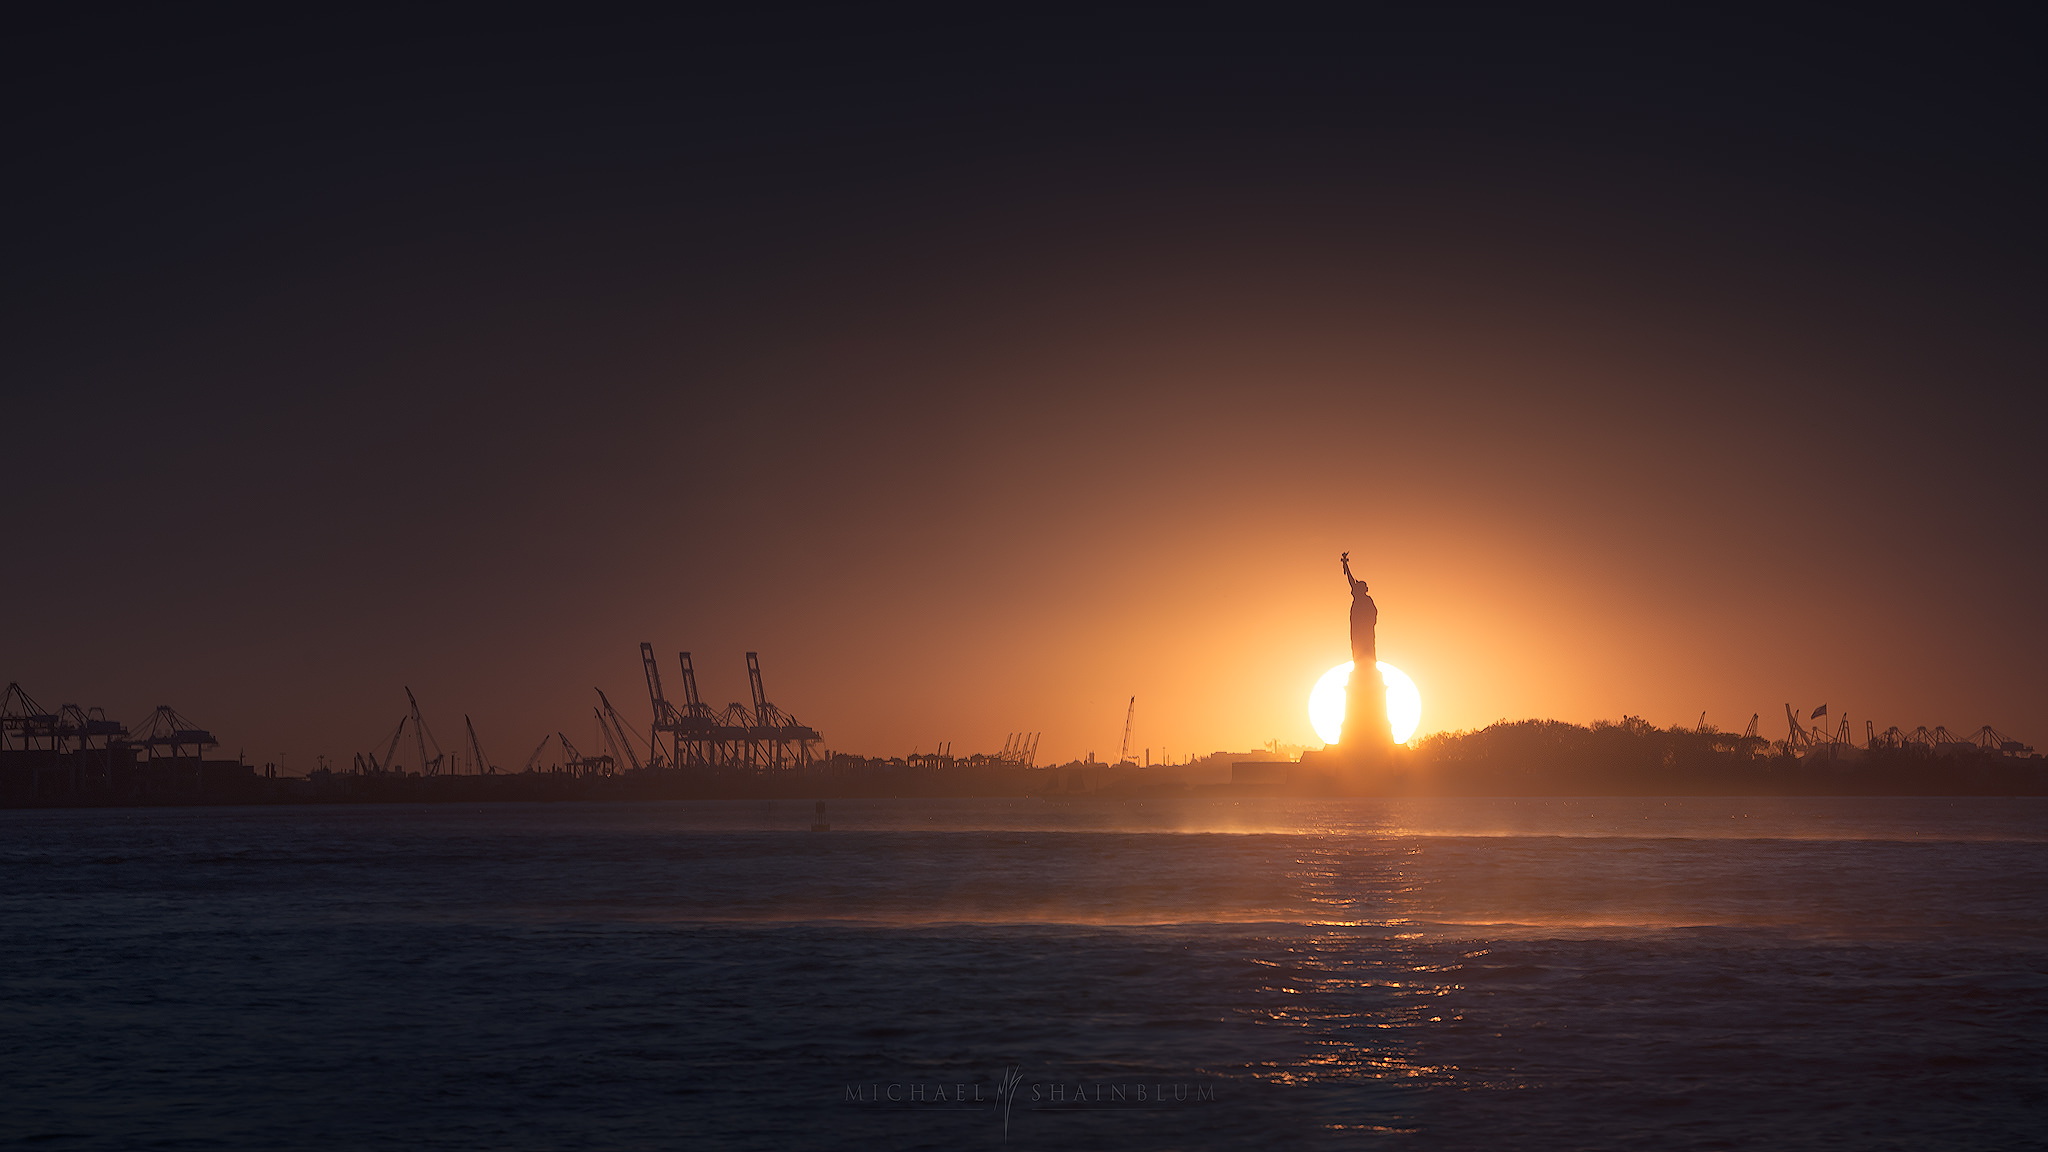 New York City, Statue of Liberty Sunset Cityscape Photography